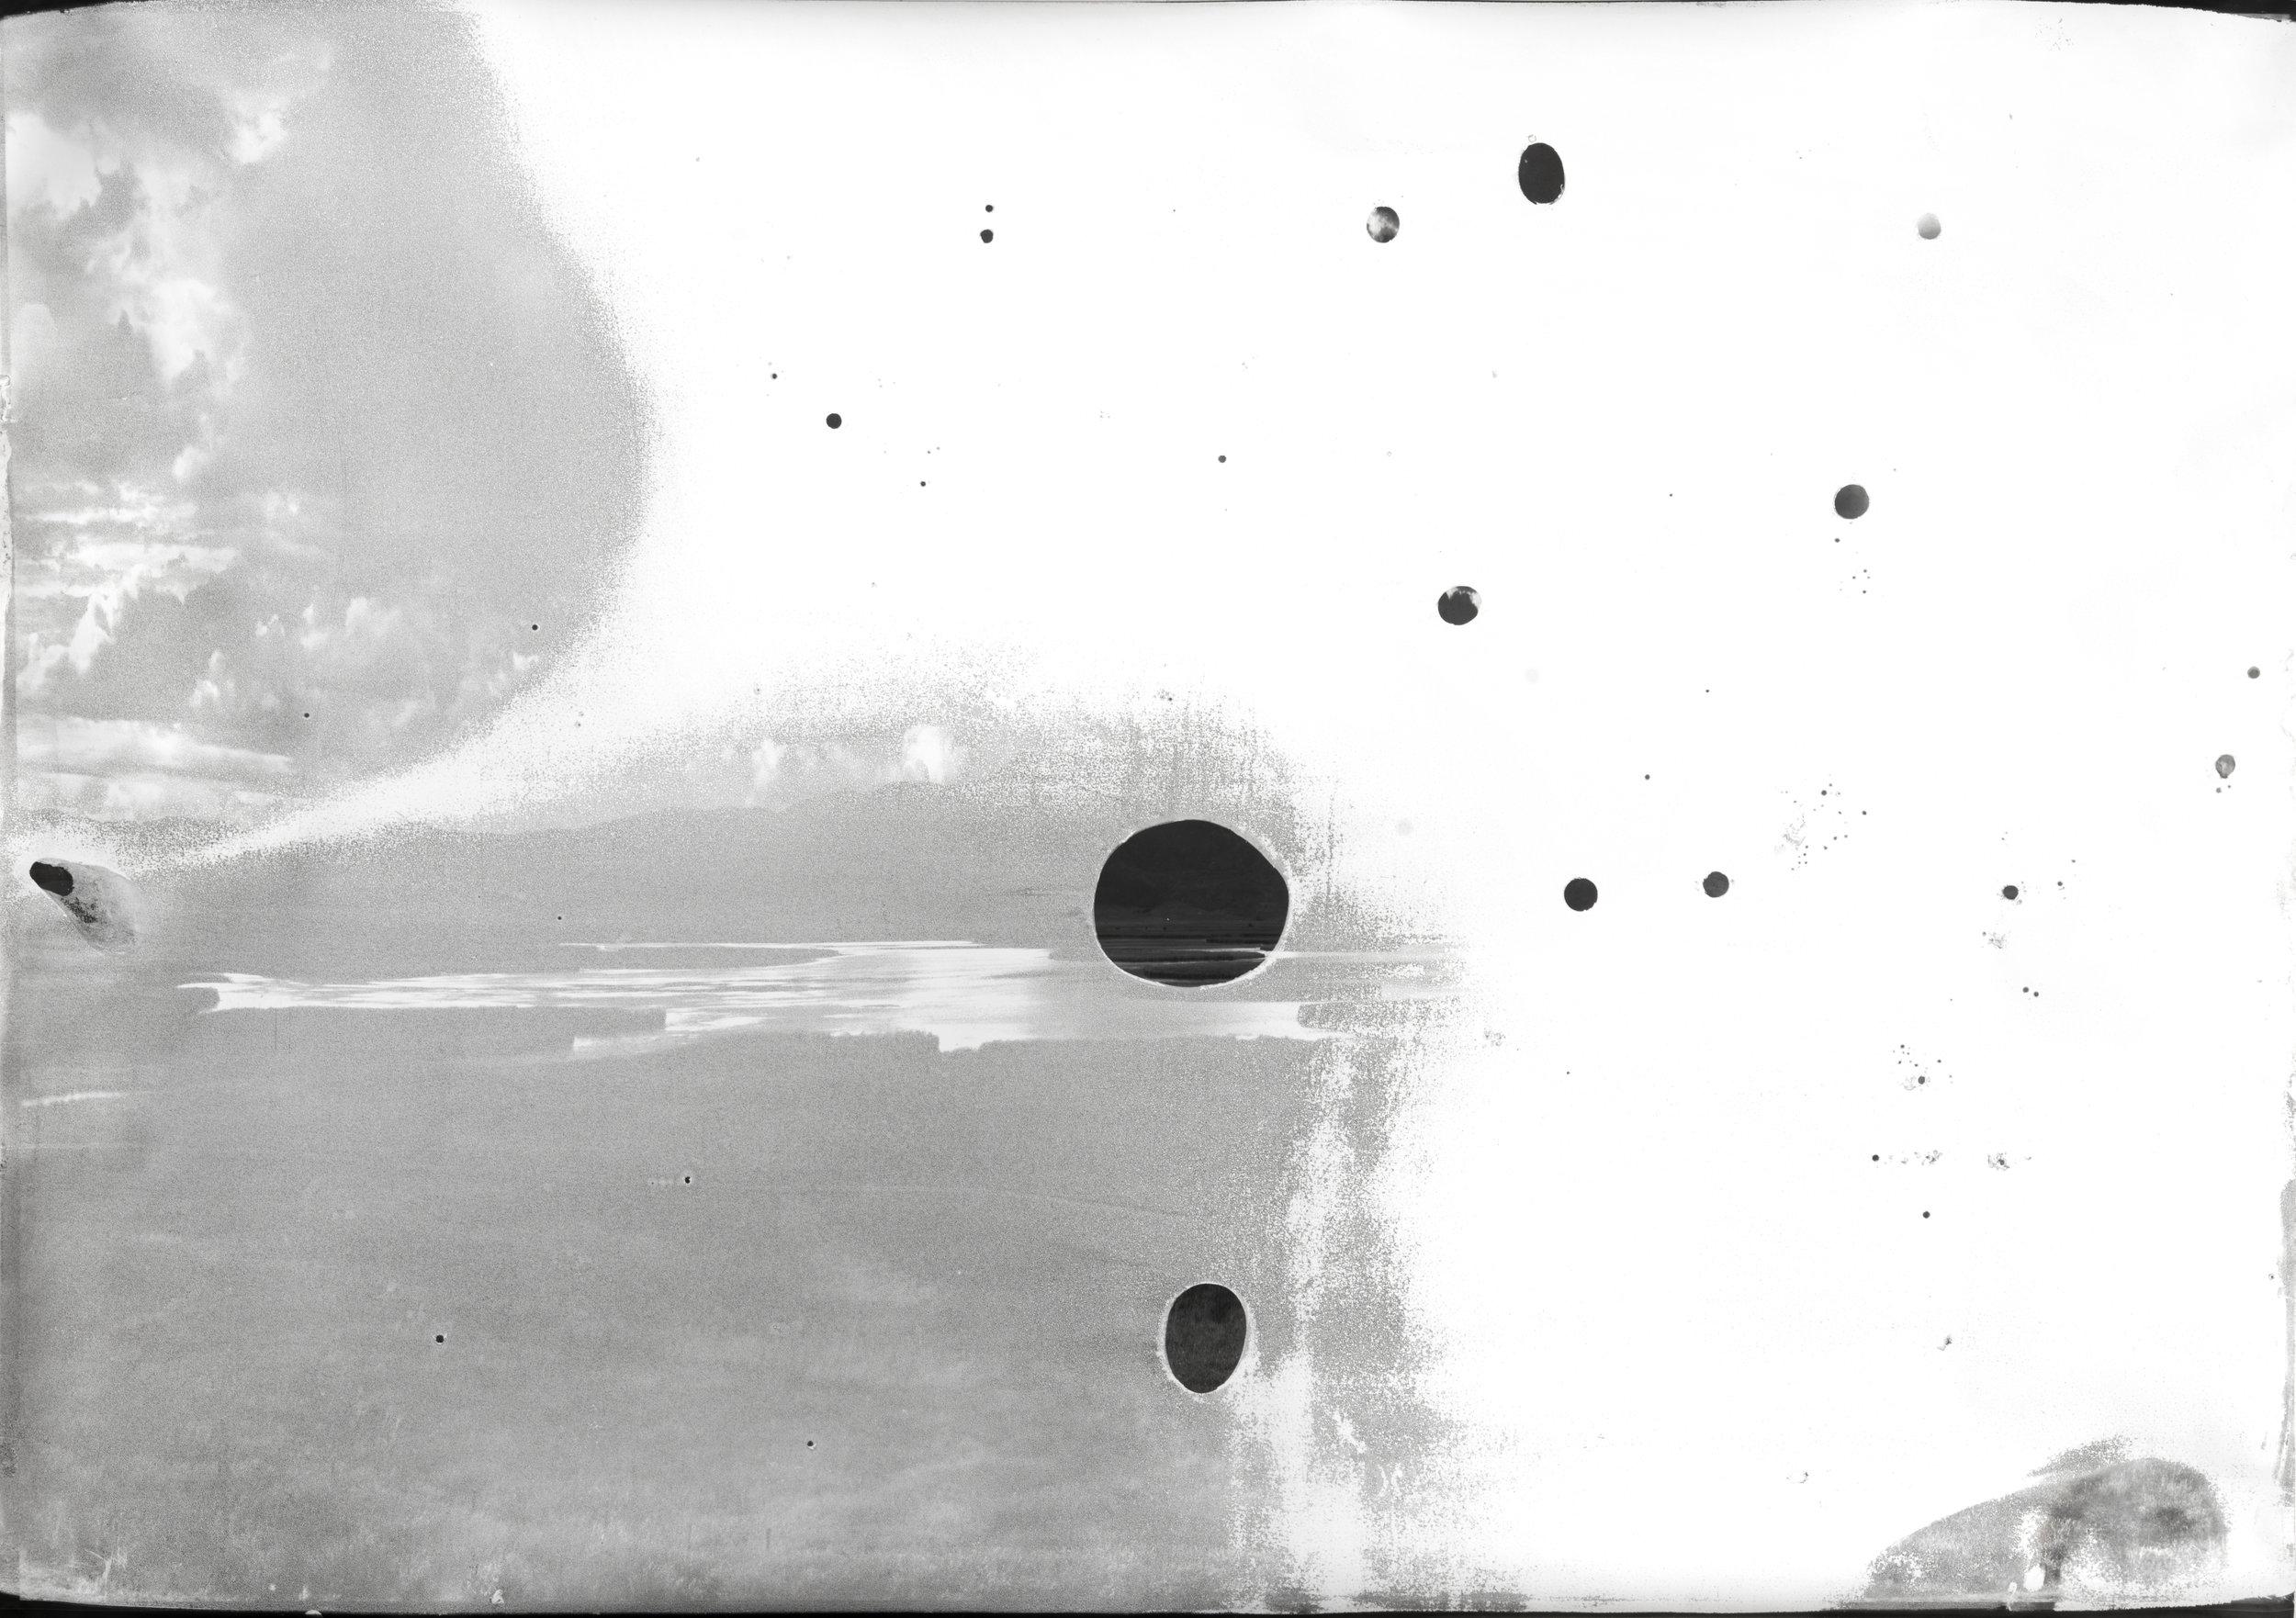 Grays Lake, ID BW A9  2013  chromogenic print soaked in Grays Lake water  42 x 60 inches